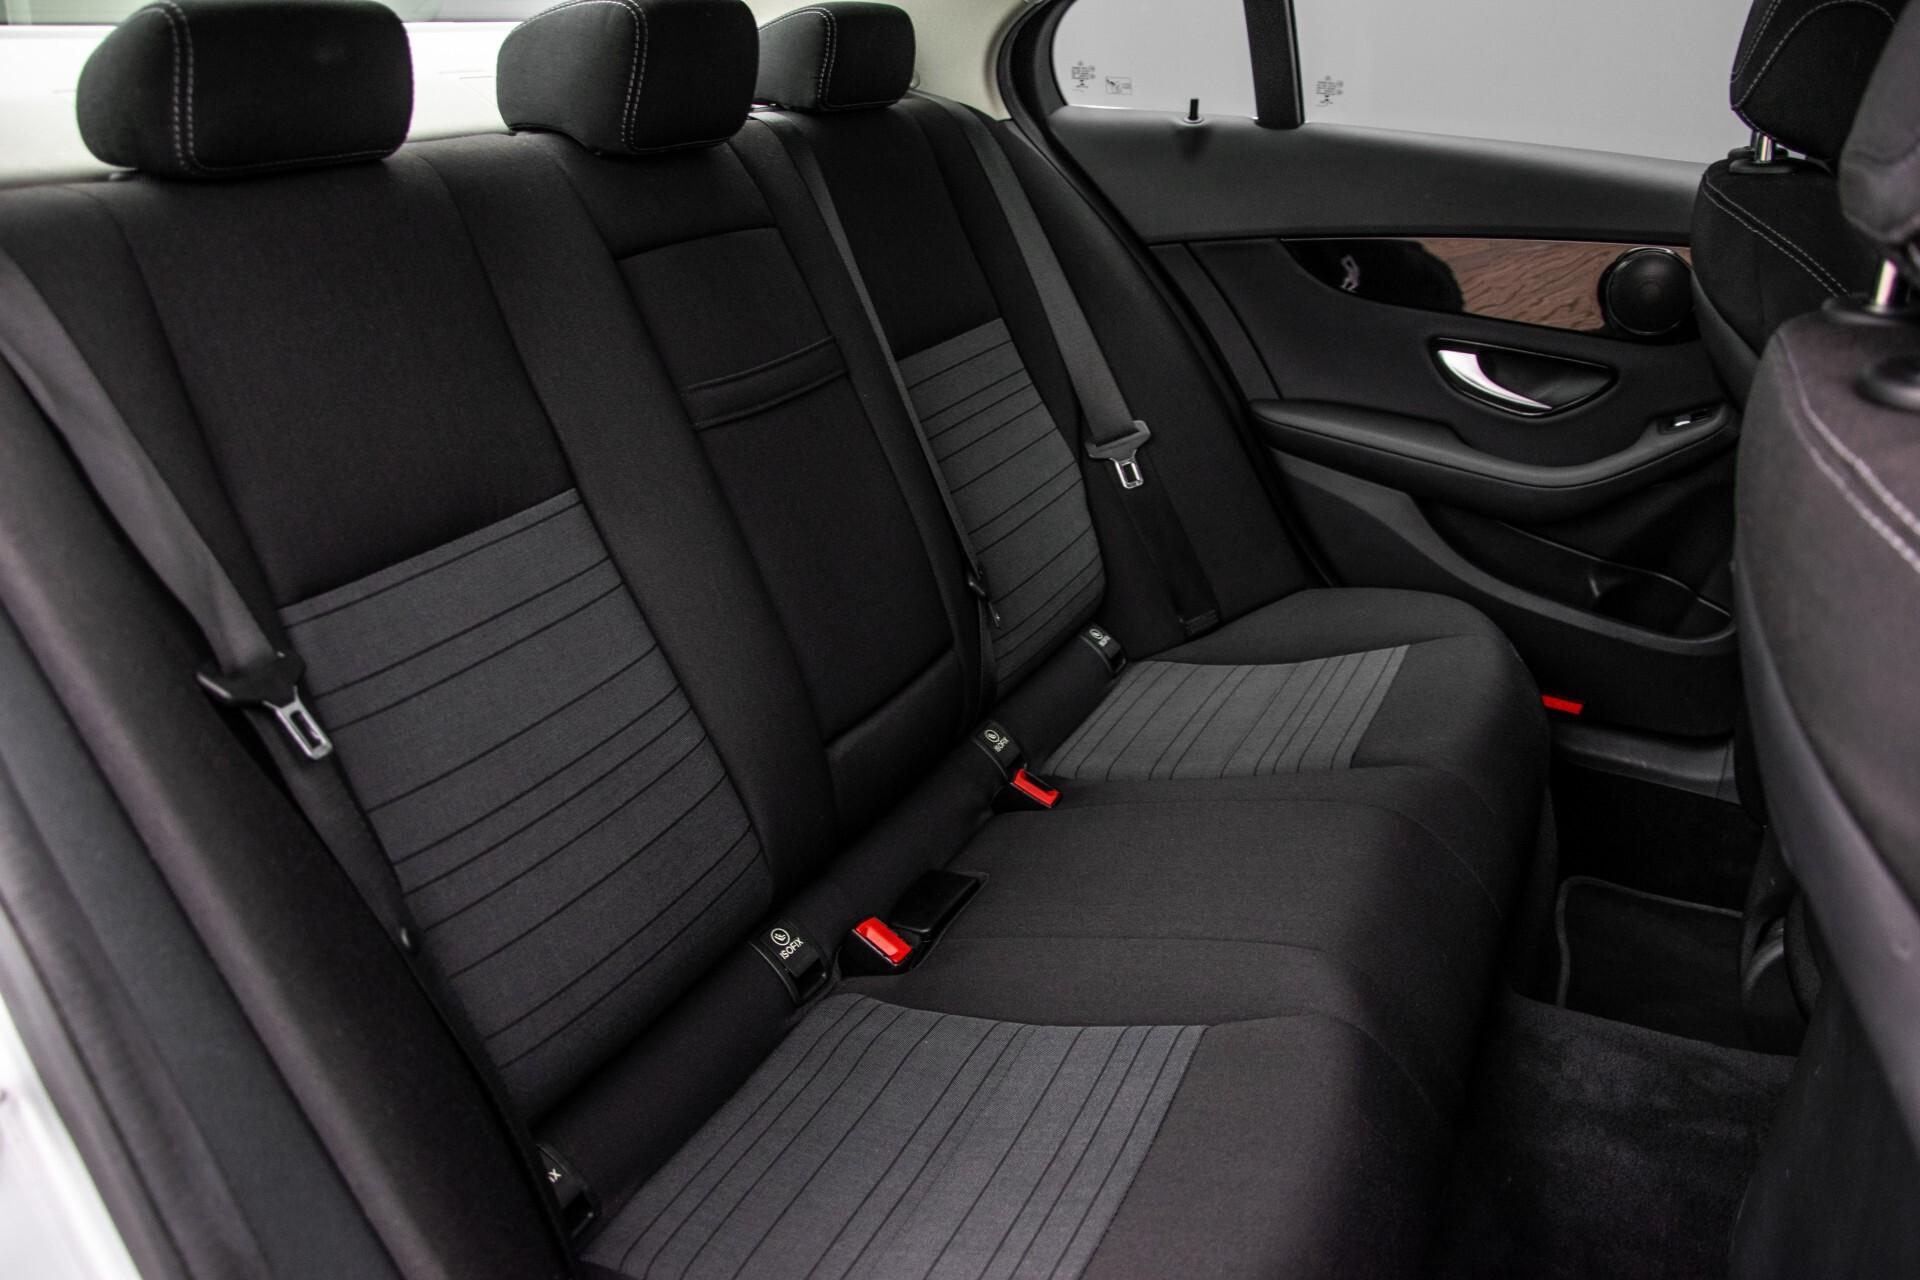 Mercedes-Benz C-Klasse 180 Bluetec Lease Edition Intelligent Light System/Cruise Control/Navi Foto 4